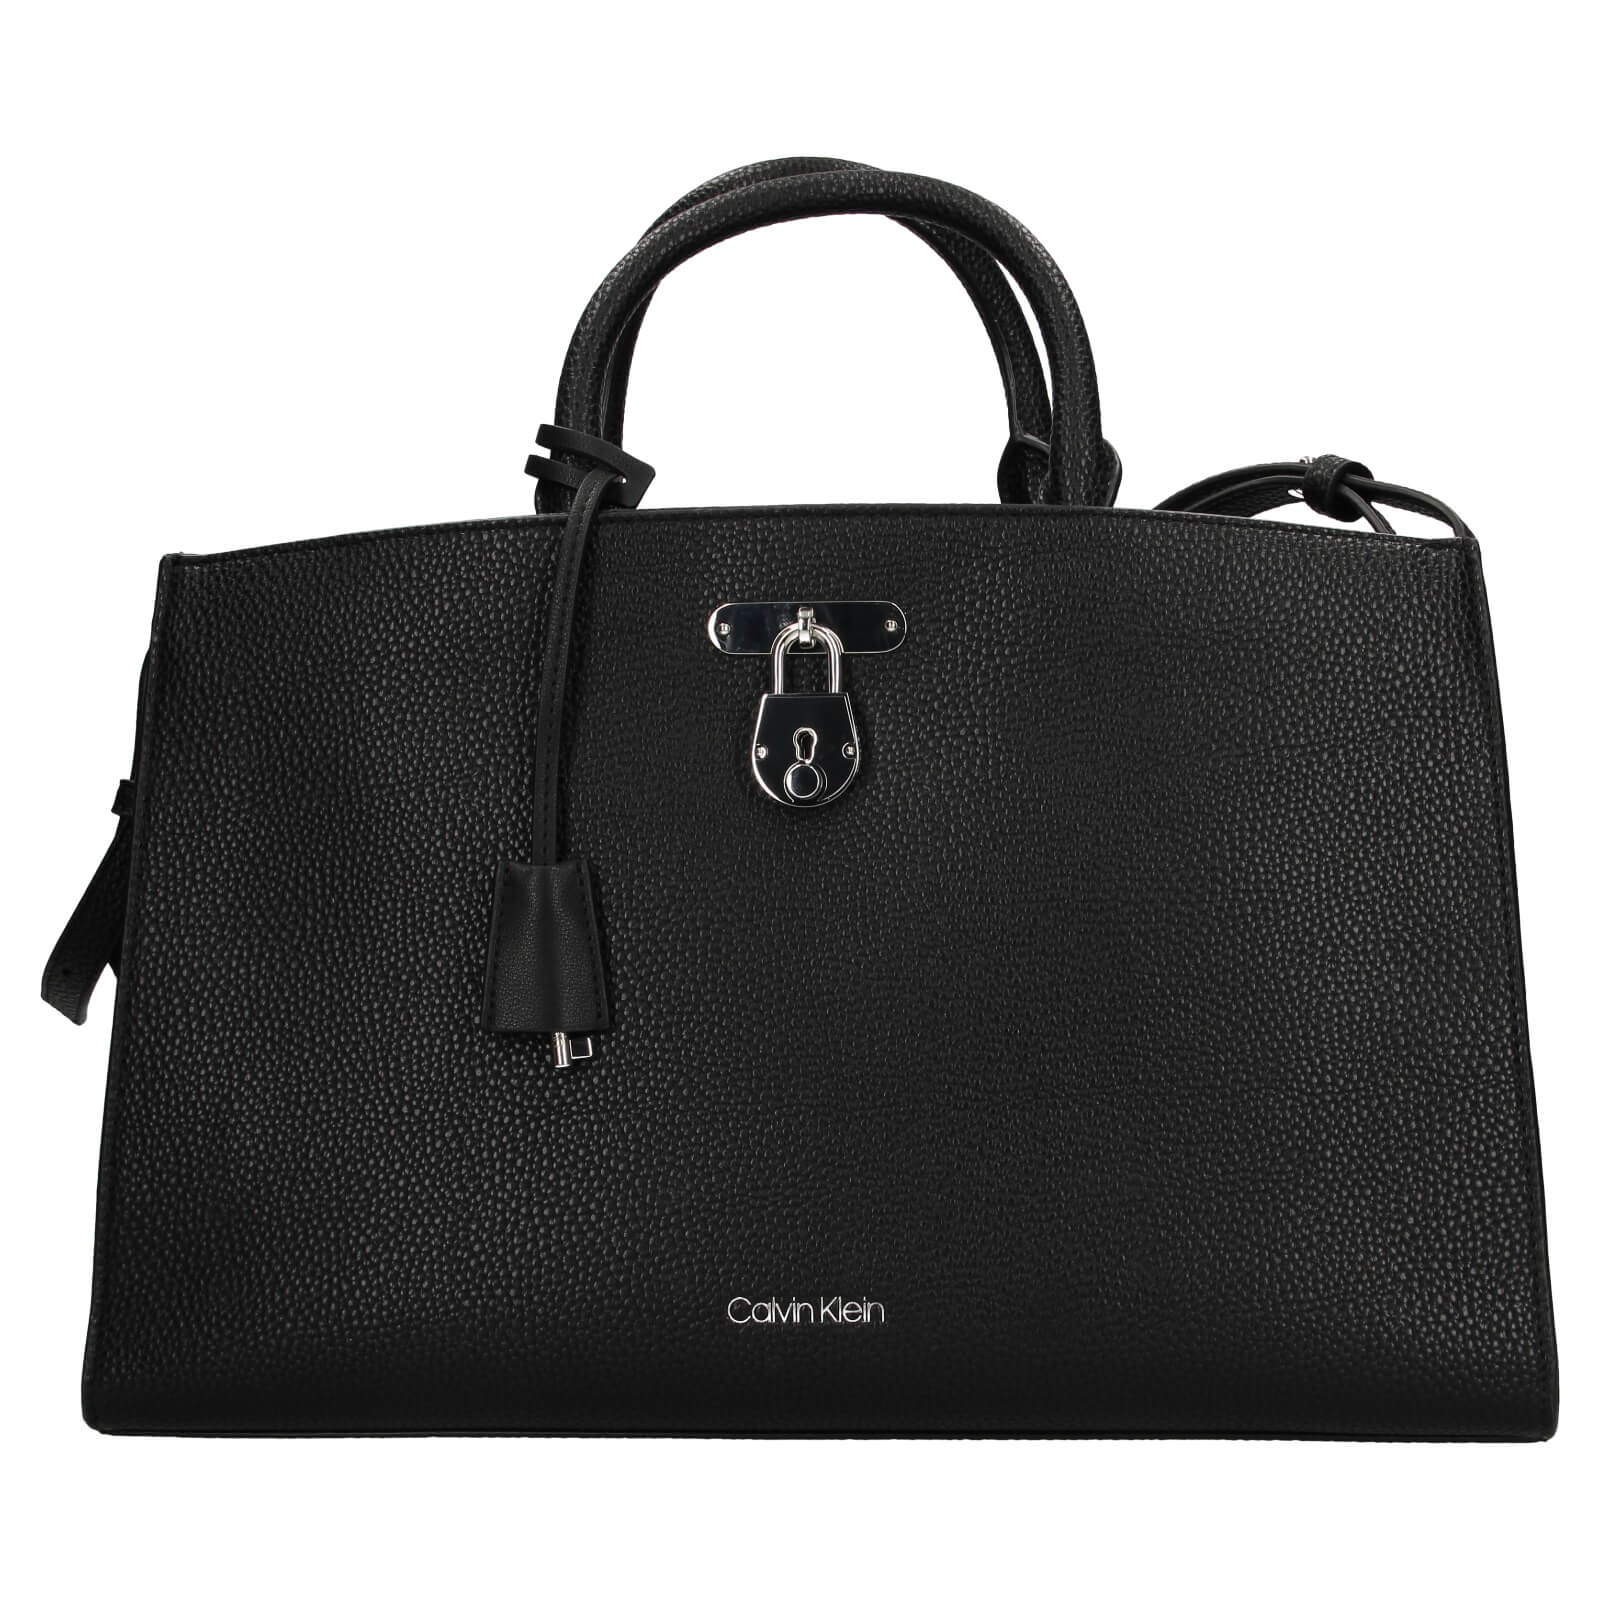 Dámska kabelka Calvin Klein Matelda - čierna